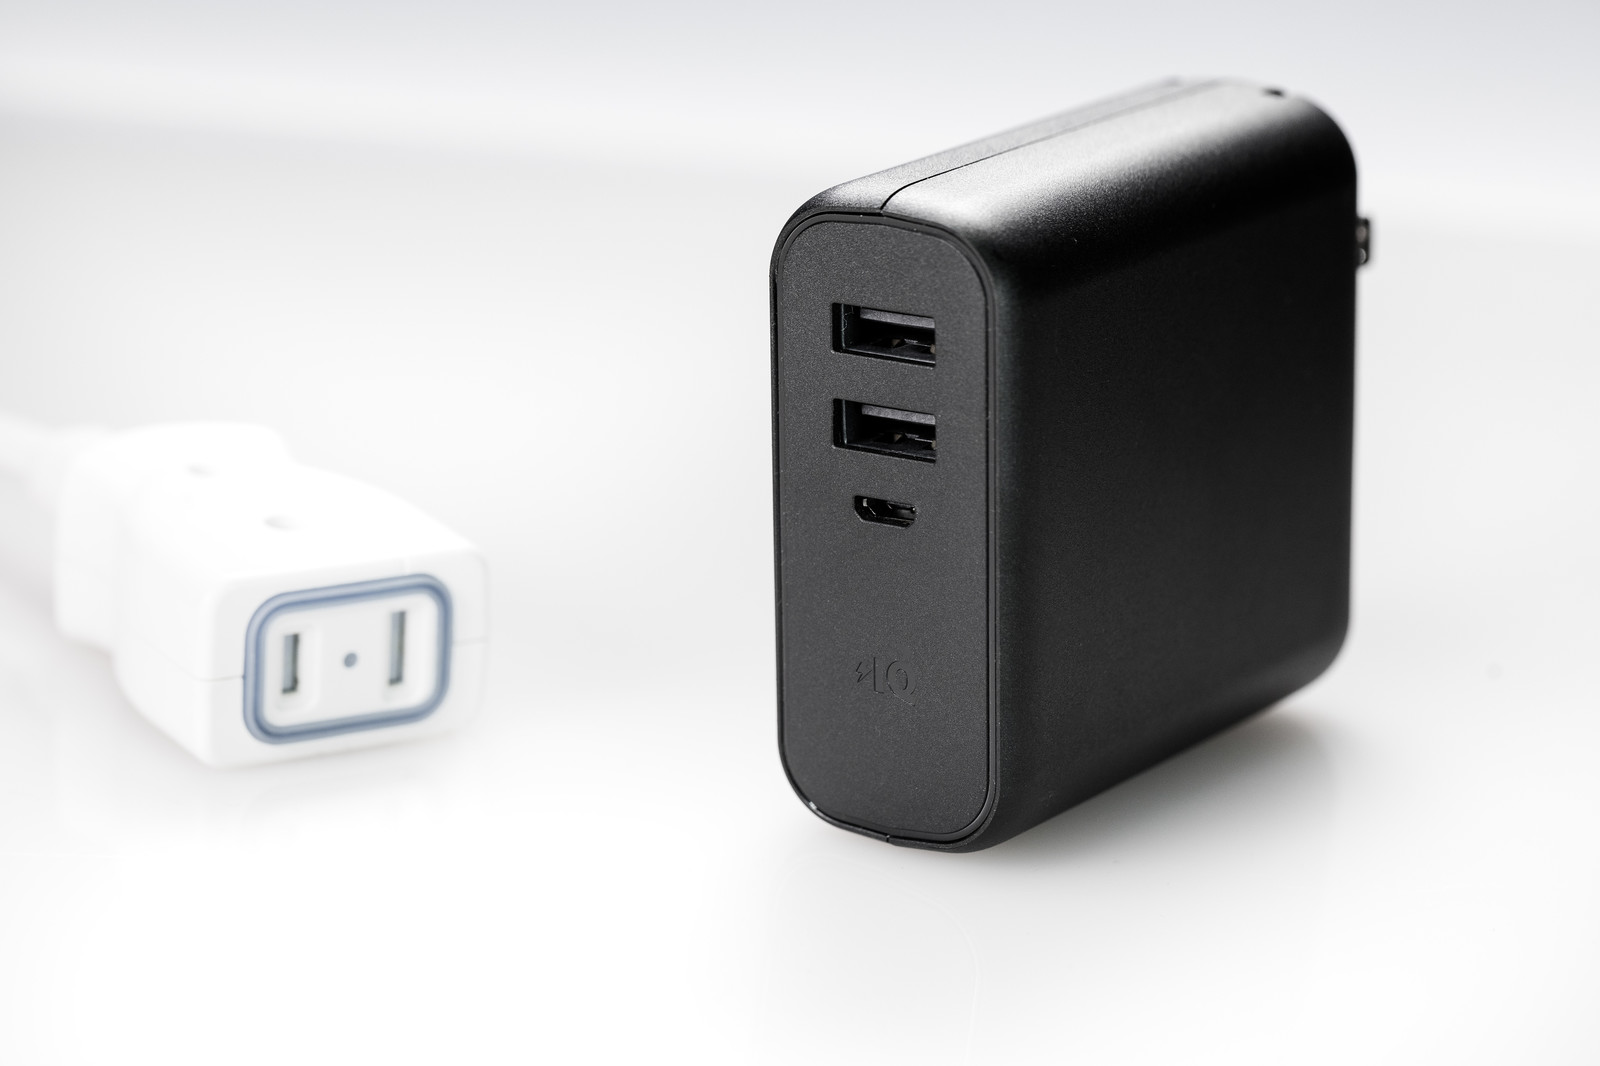 「USBポートが2つあるモバイルバッテリー」の写真